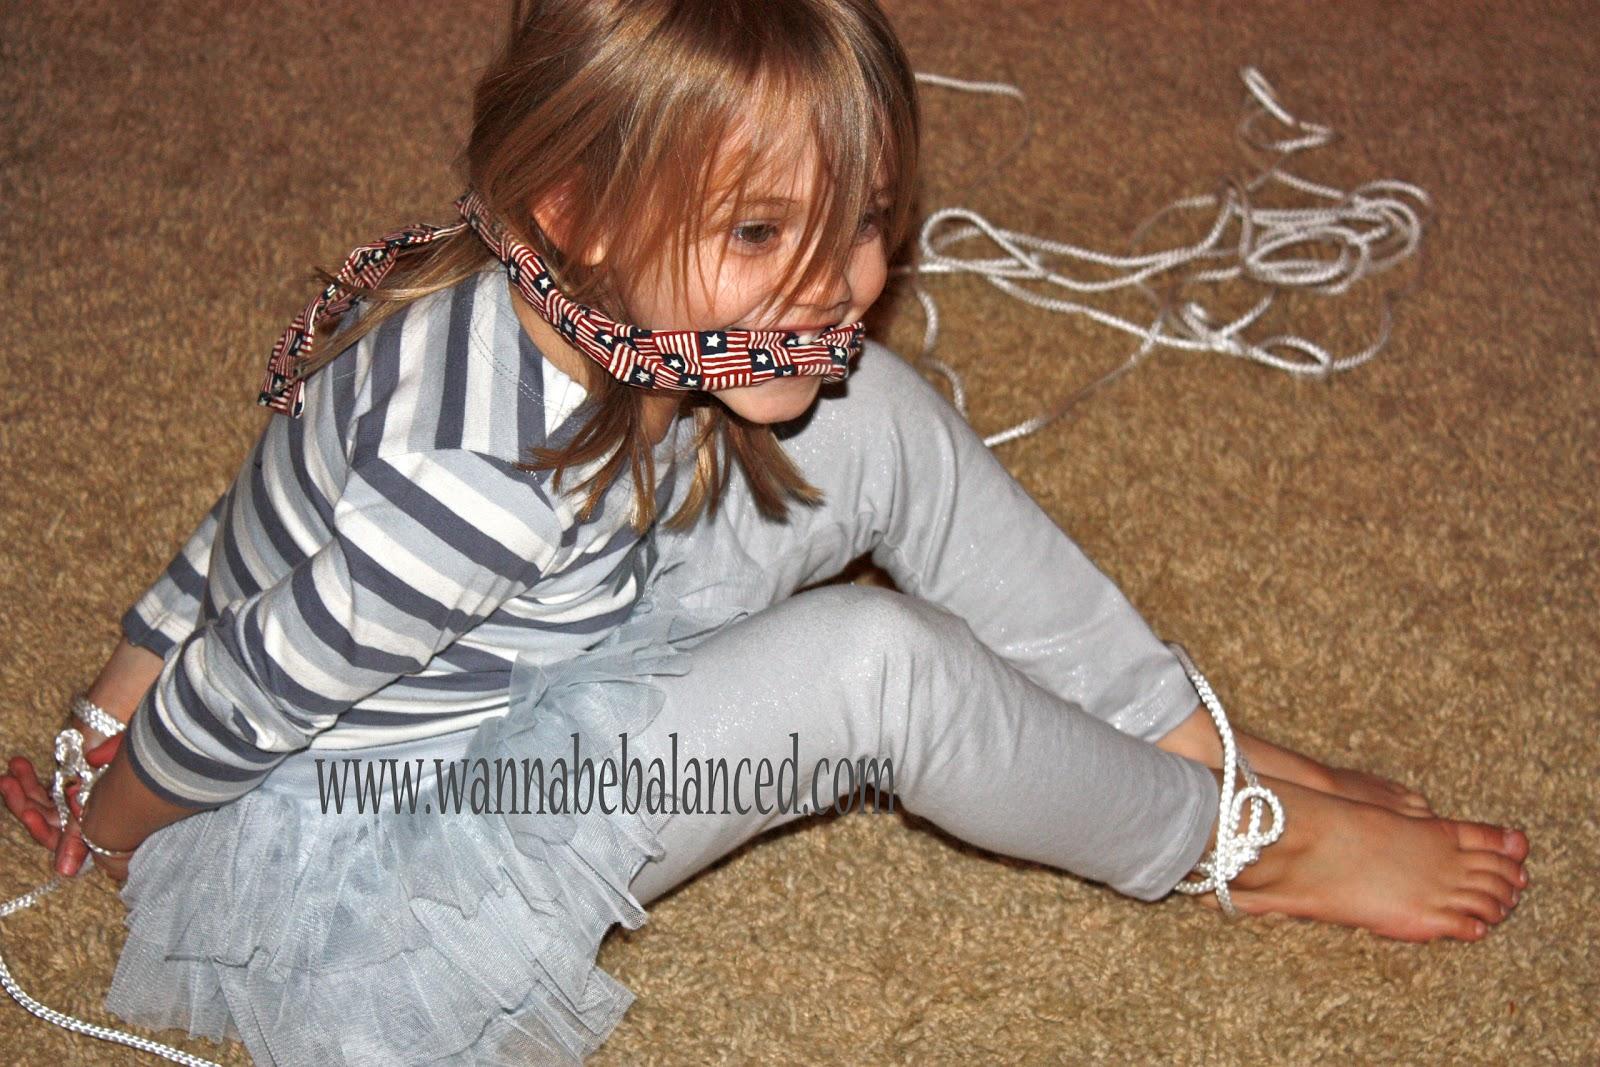 Bondage girls tie up games mom